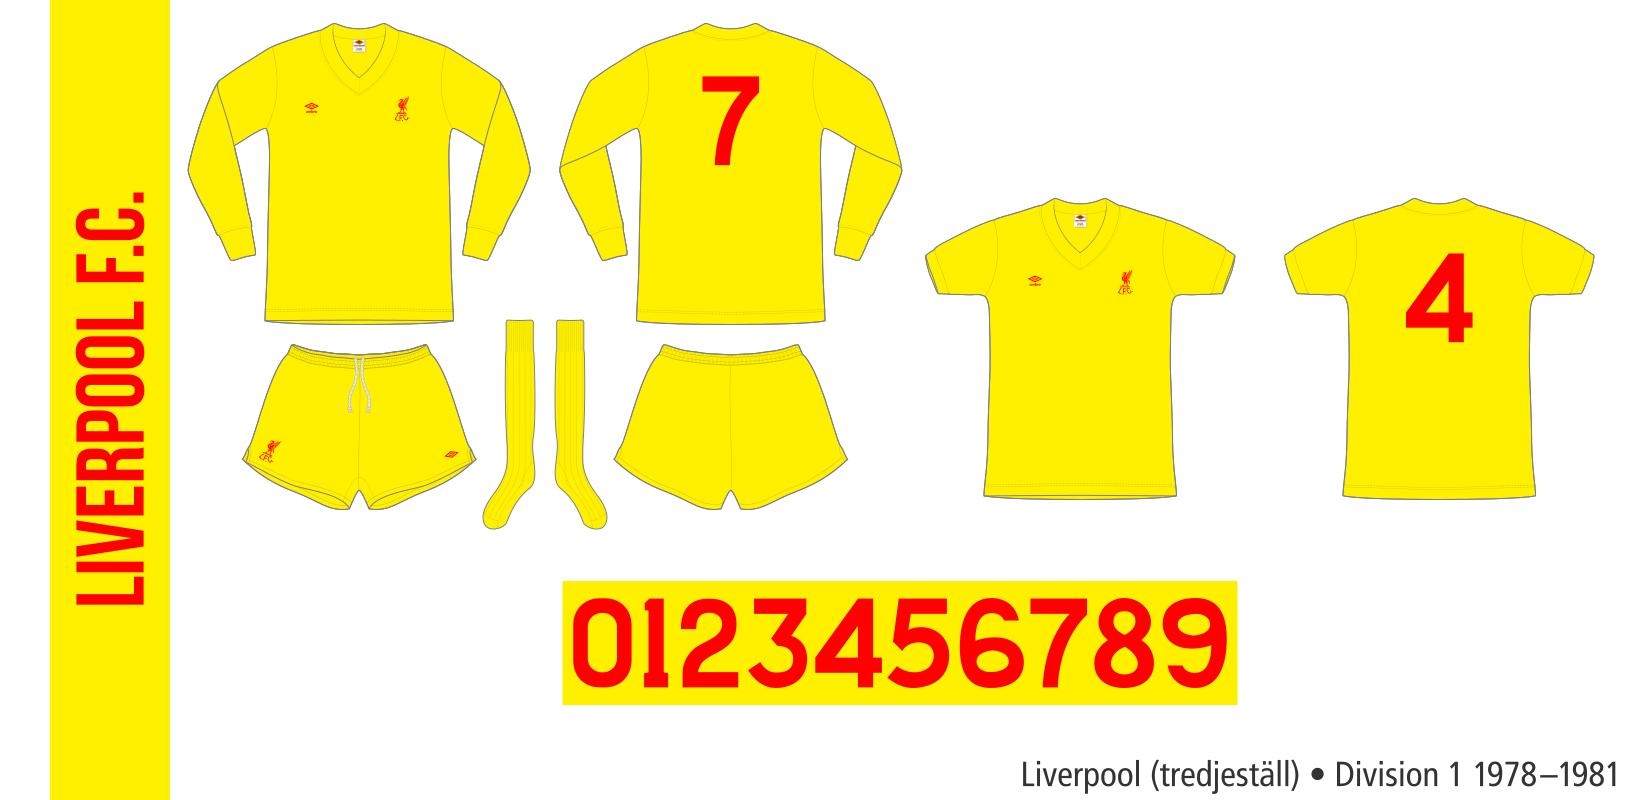 Liverpool 1978–1981 (tredjeställ)